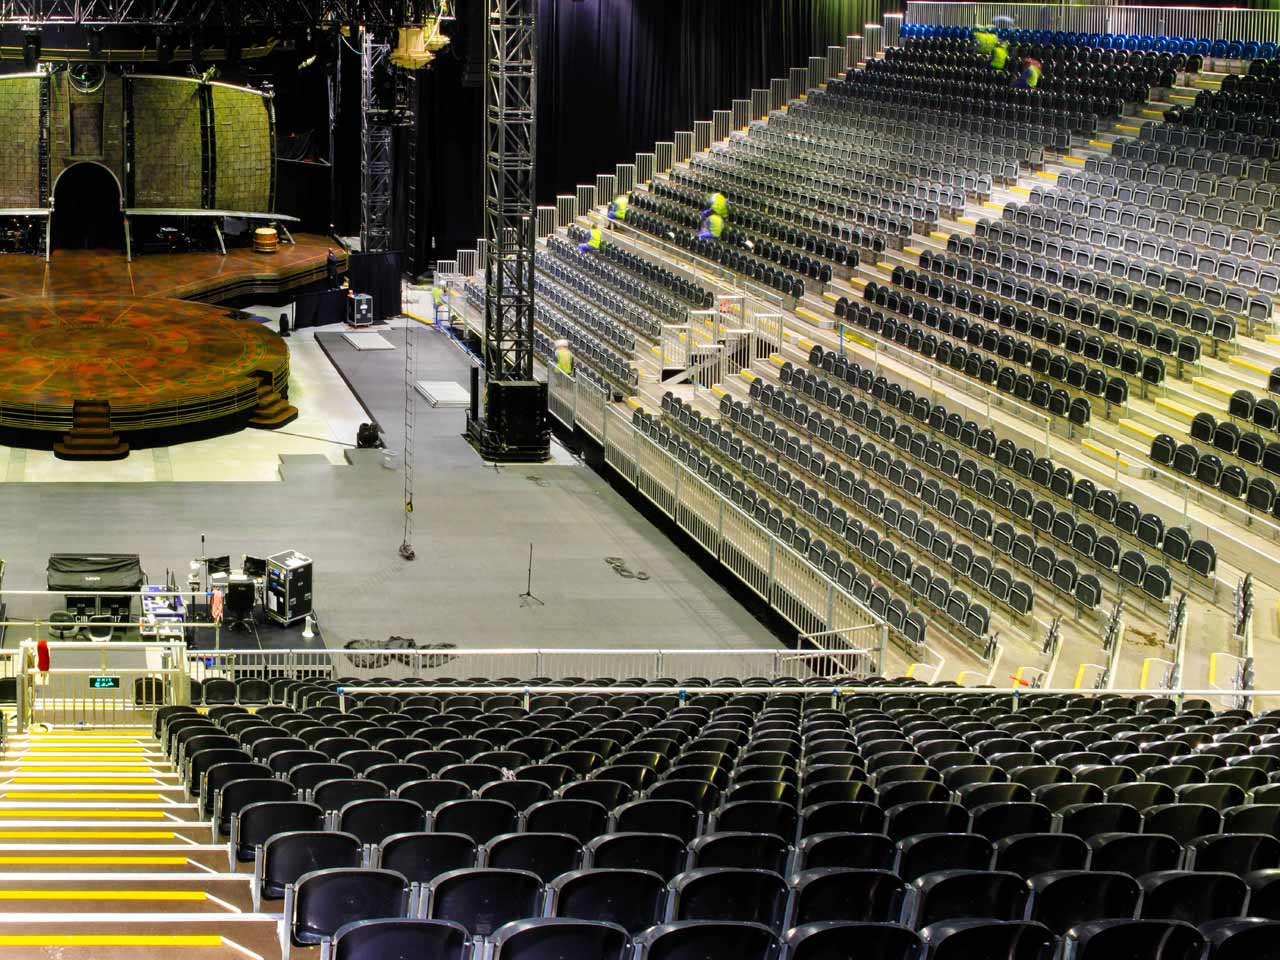 grandstand-seats-events-setup-rental-stadium-seating-sport-management-film-festival-seating-screening-f1-open-air-cinema-11